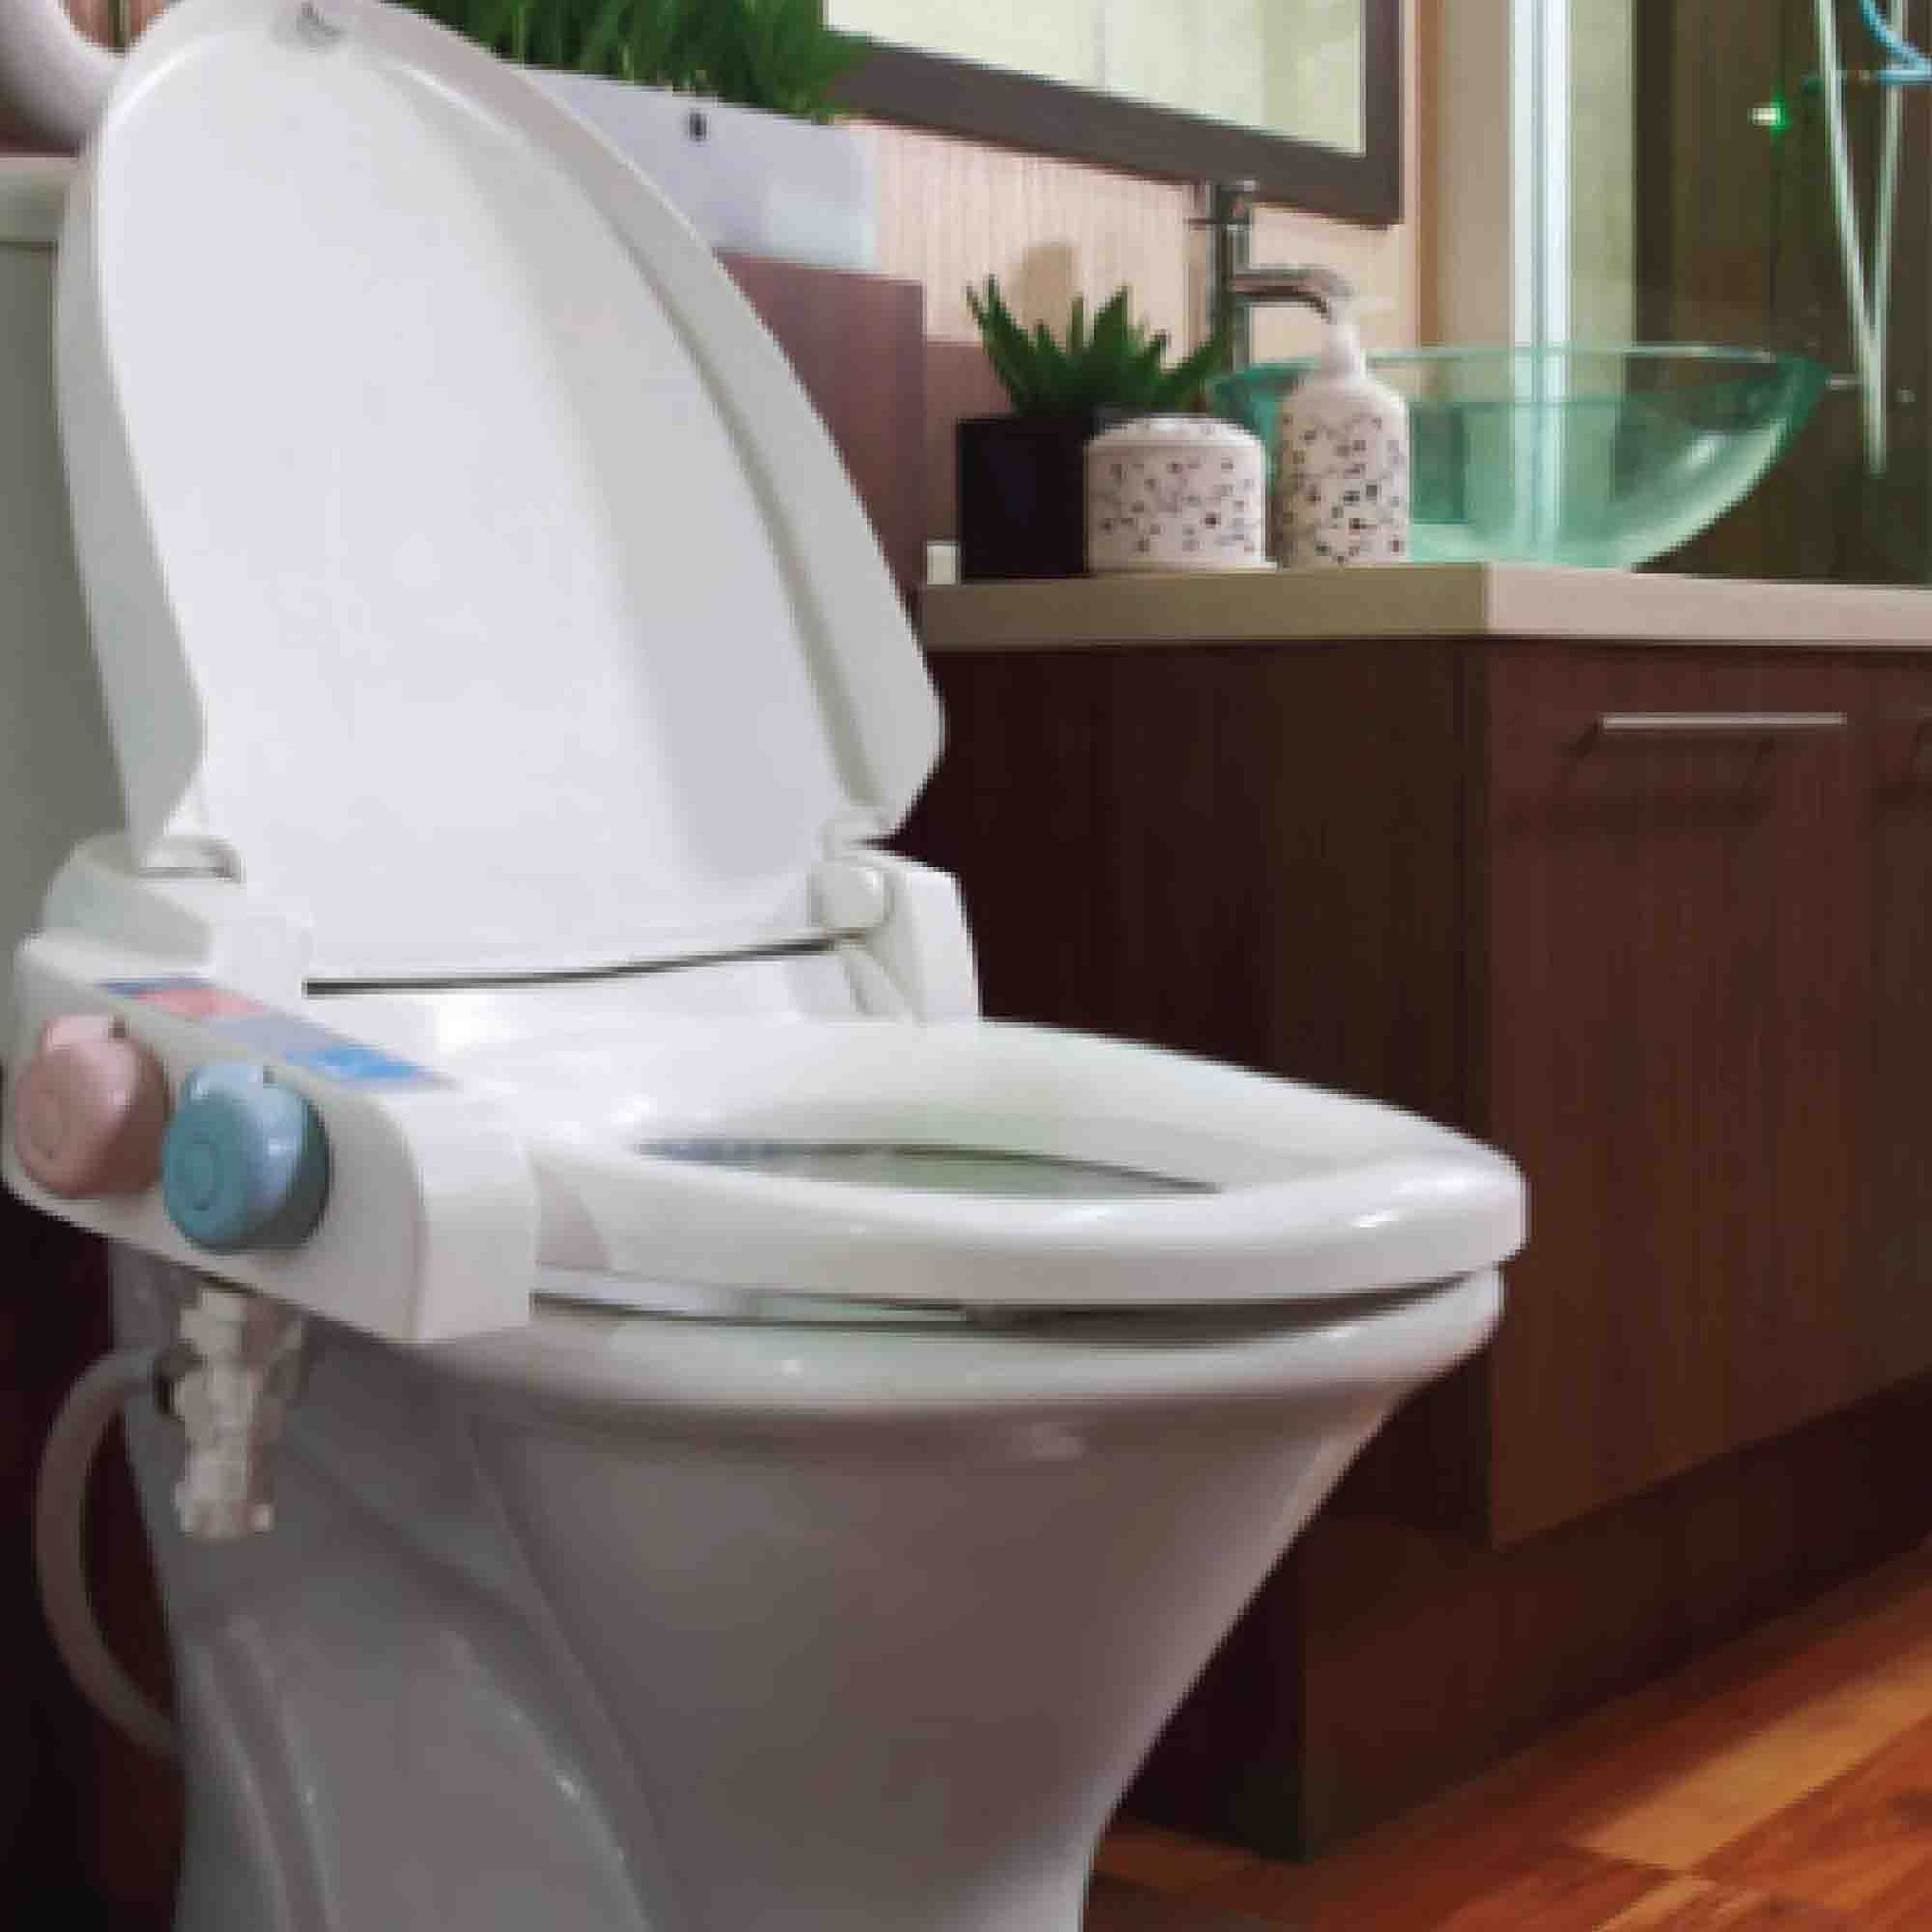 mechanical spray l fresh attachment greenco bathroom bidet seat home kitchen dp toilet water com non electric amazon